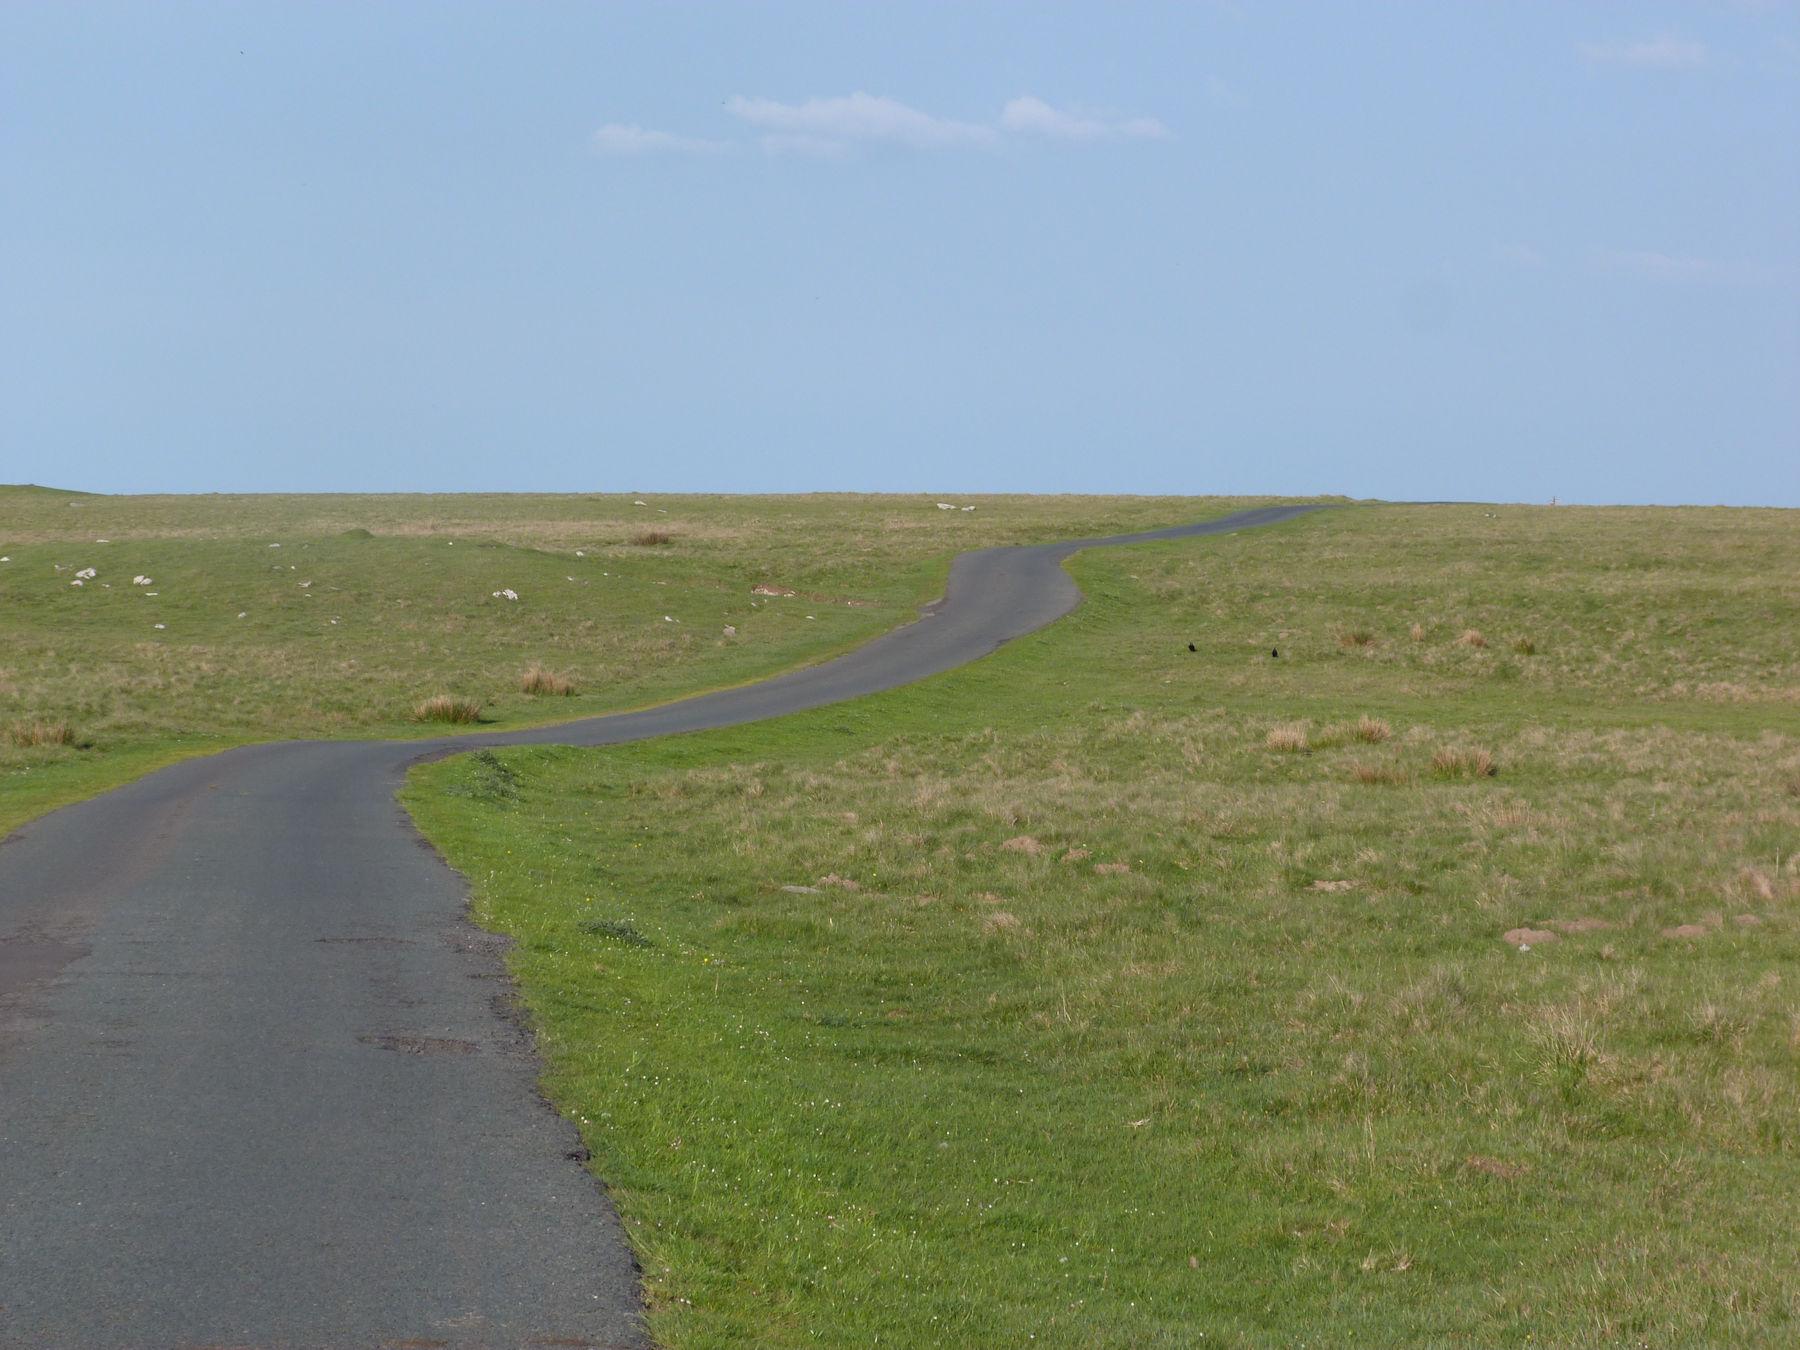 A 'Herriott' Road